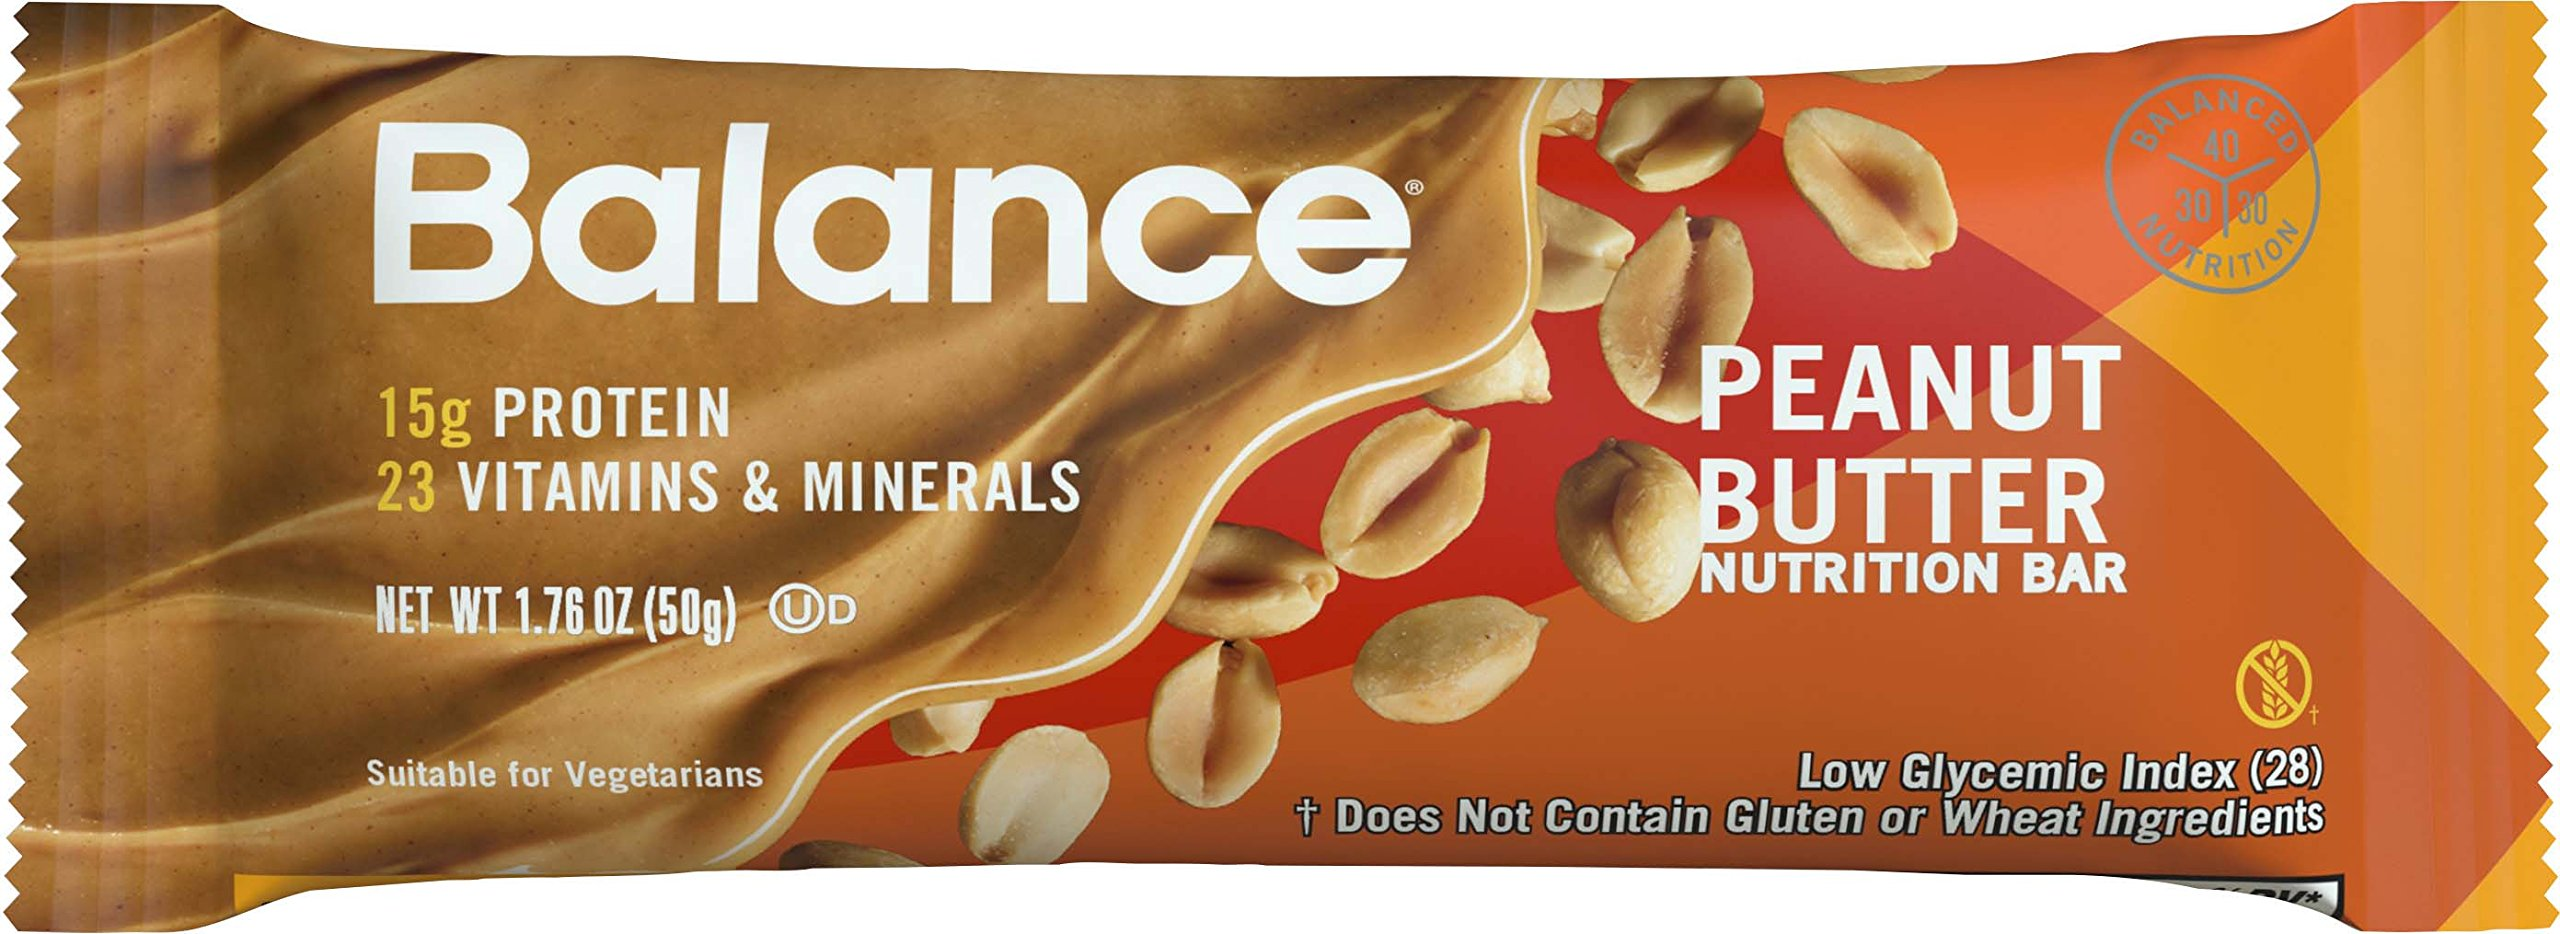 Balance Bar, Peanut Butter, 6-Count (Pack of 6)